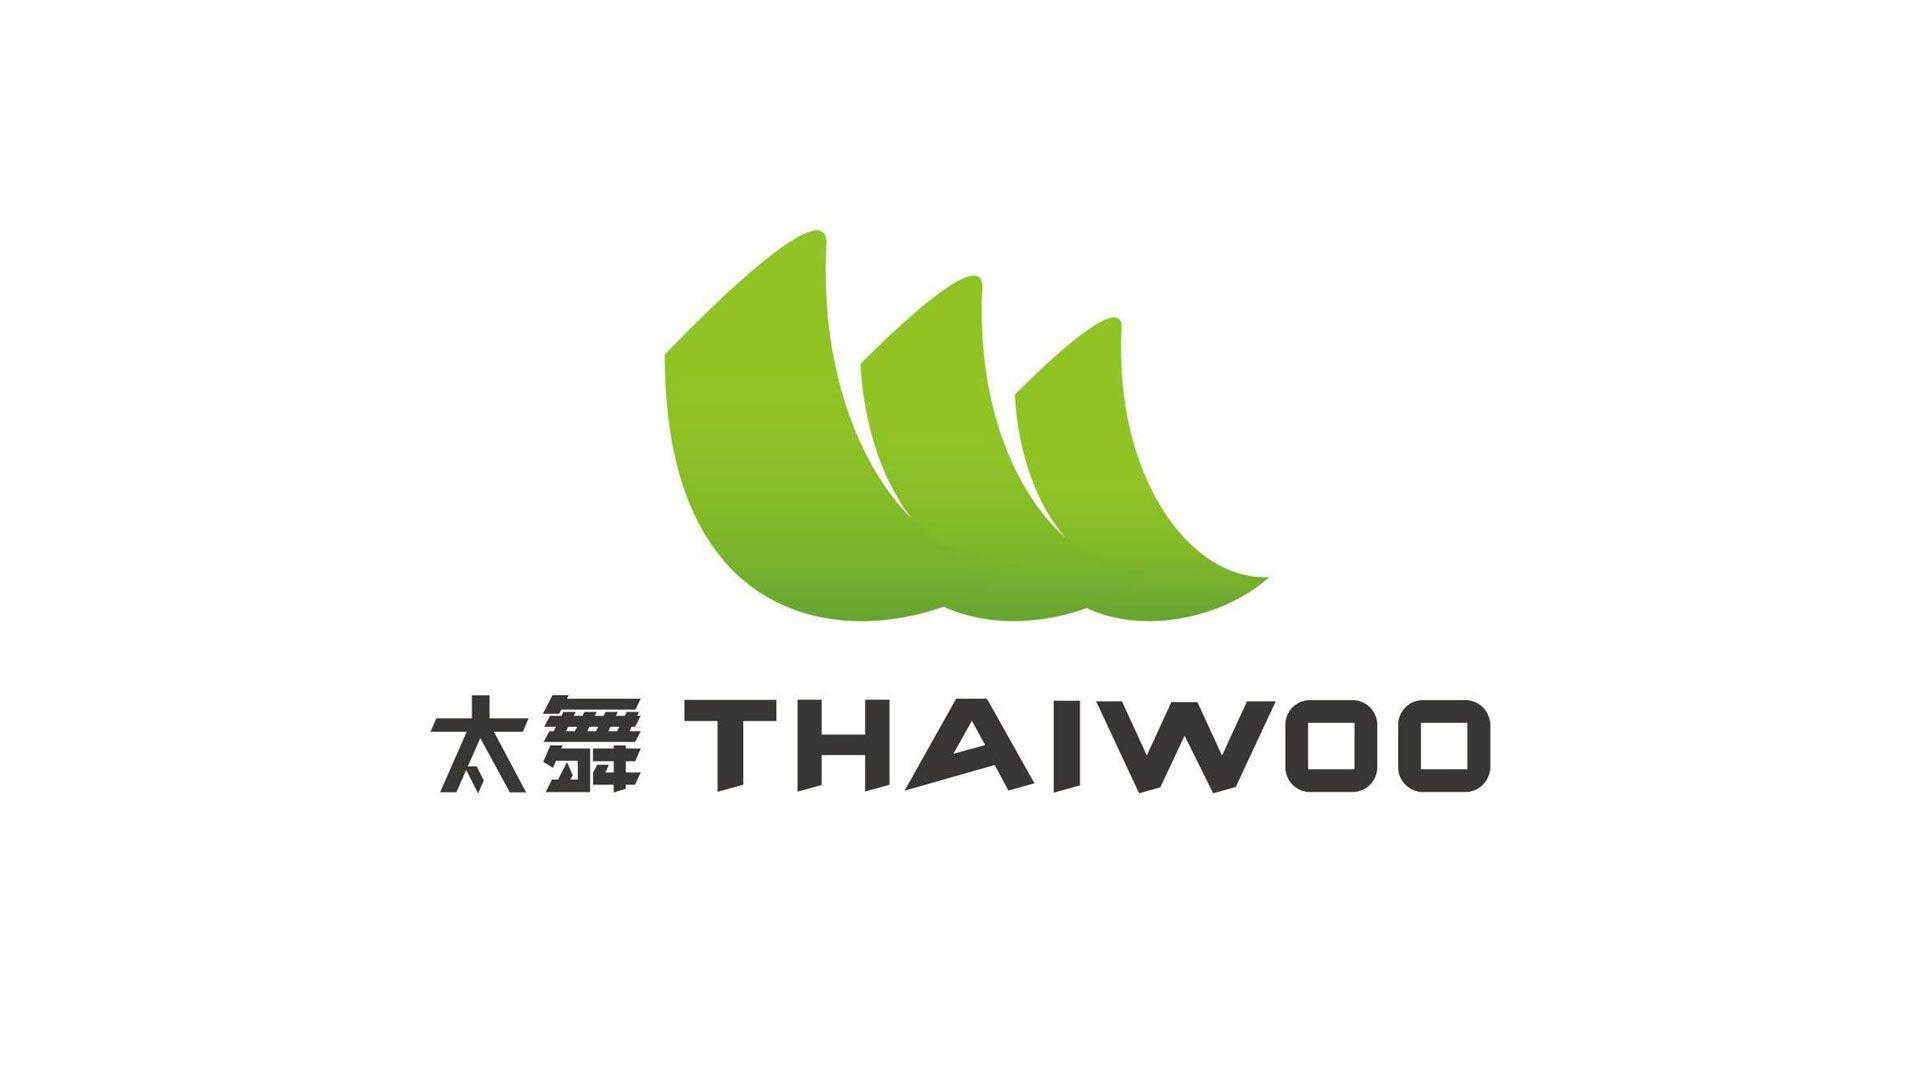 Thaiwoo Logo